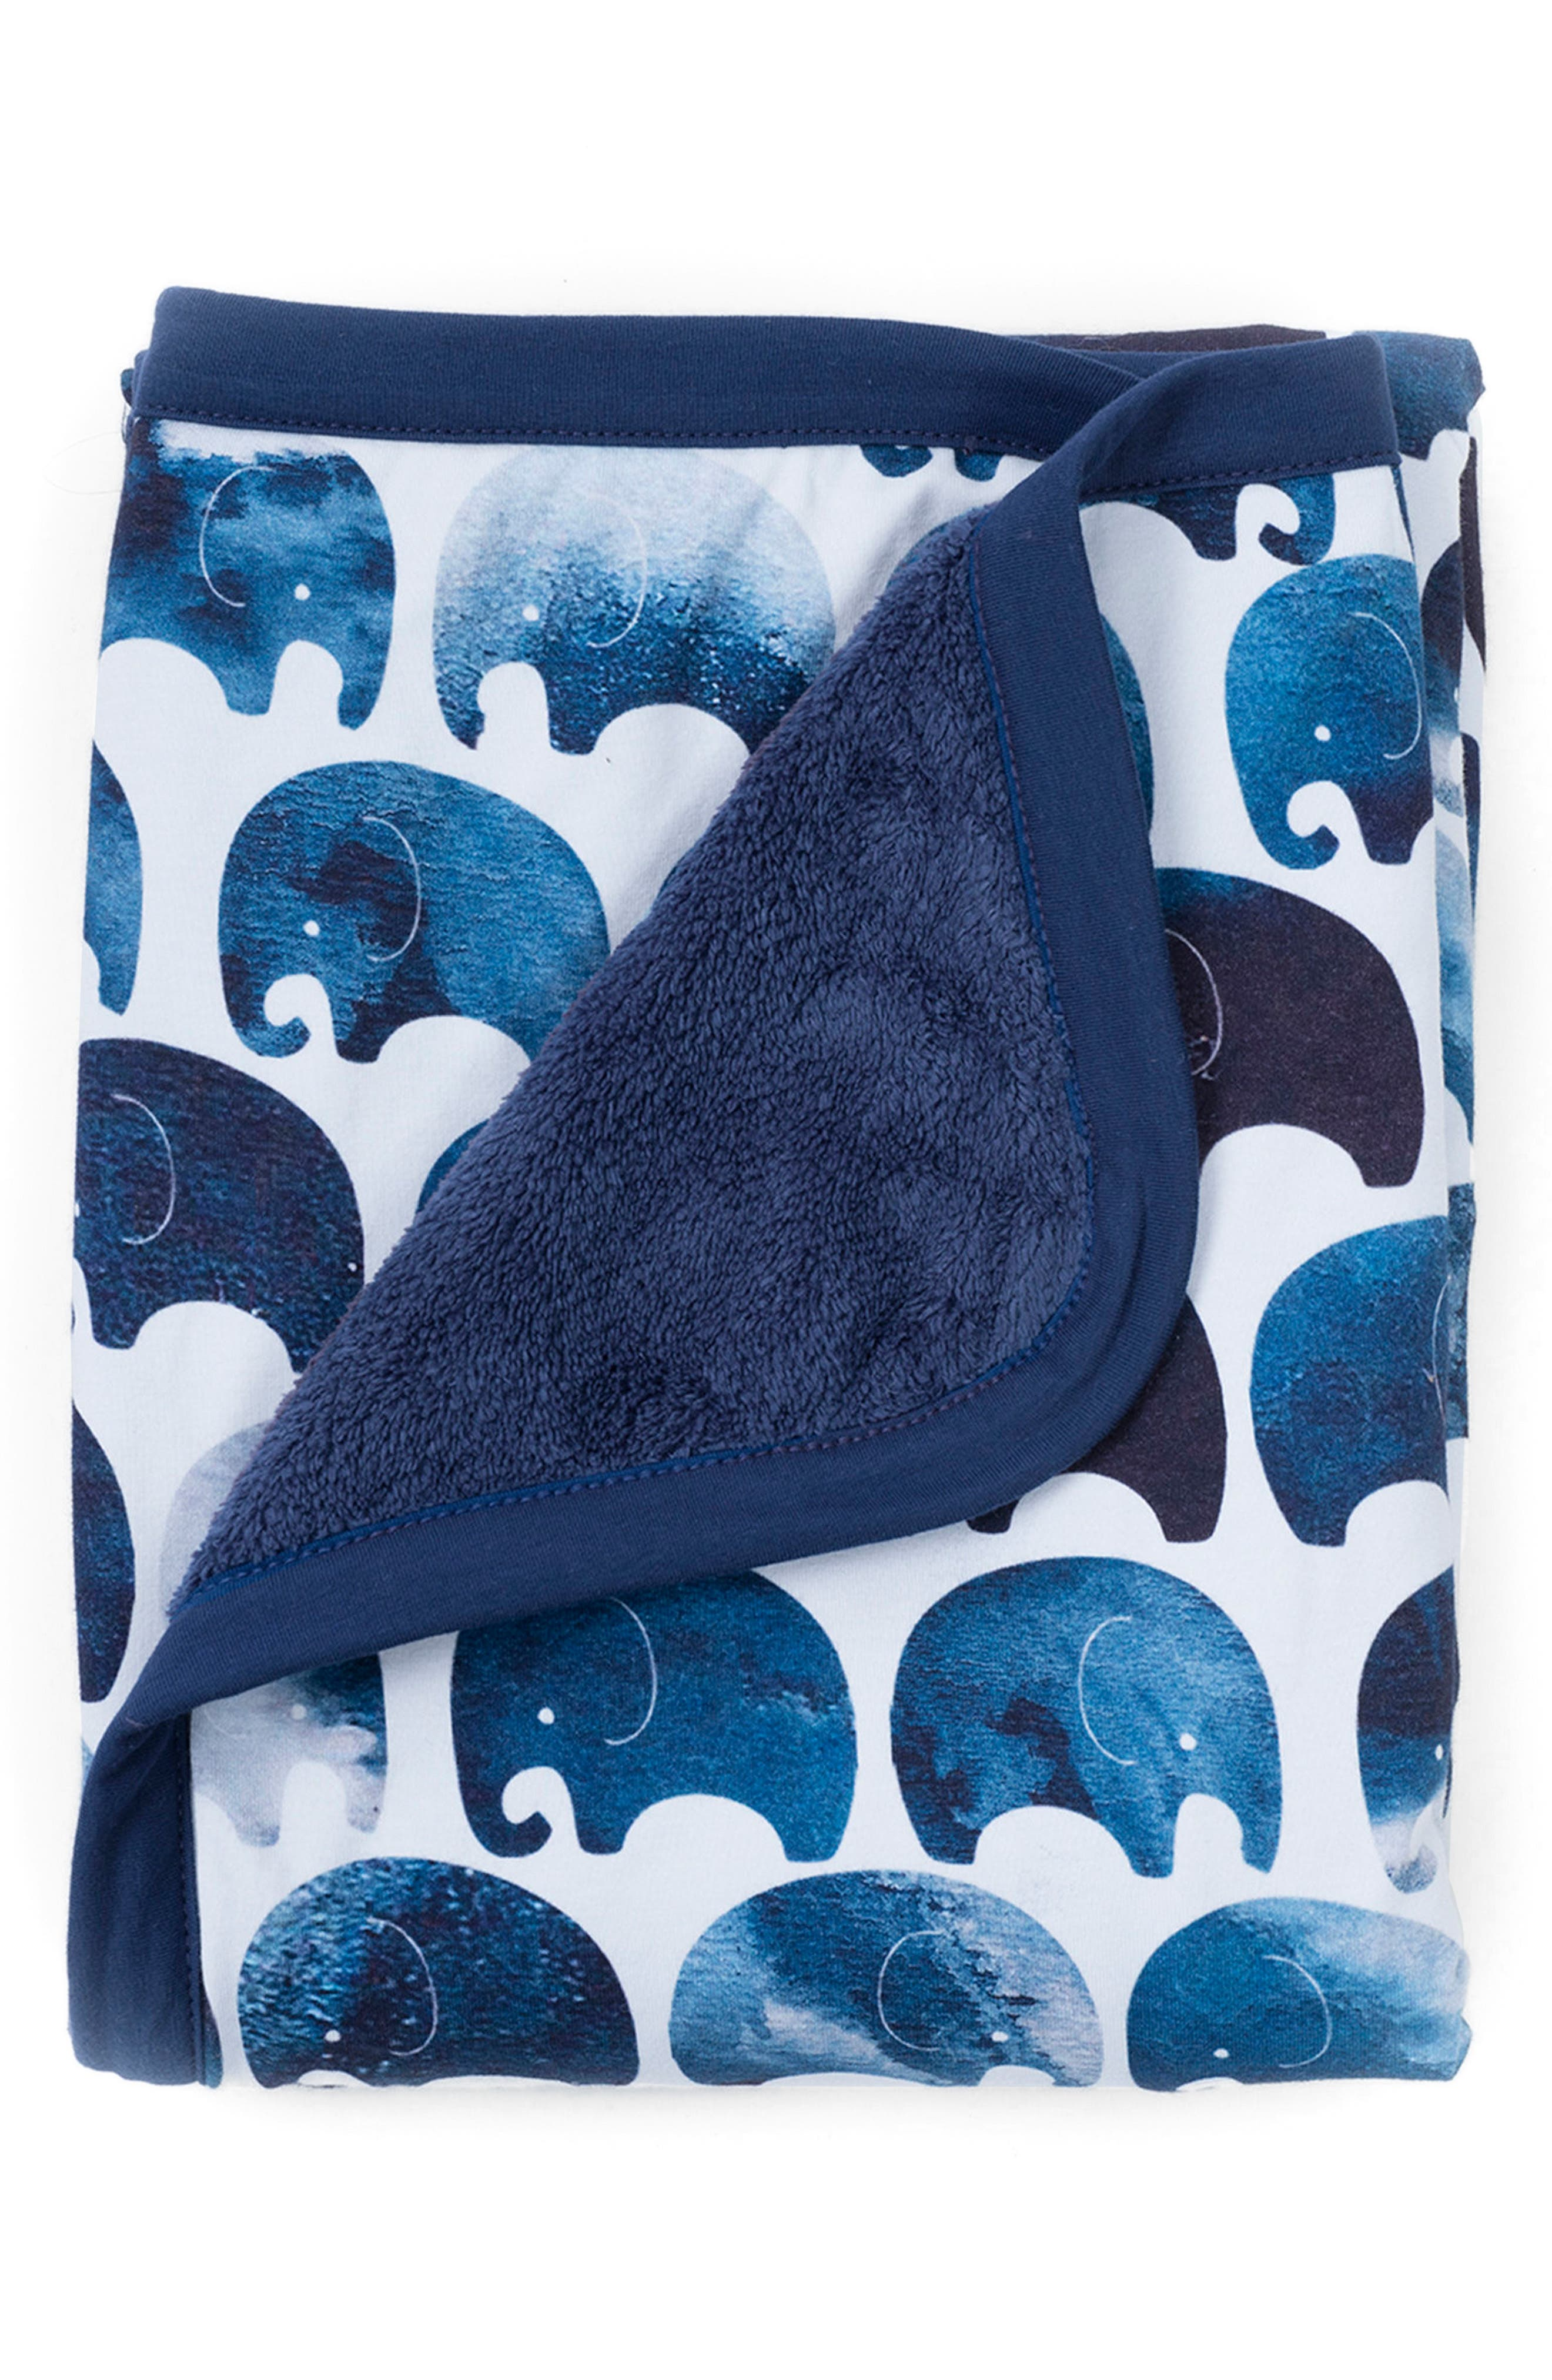 Elefant Blanket & Moon Pillow Set,                             Alternate thumbnail 3, color,                             ELEFANT